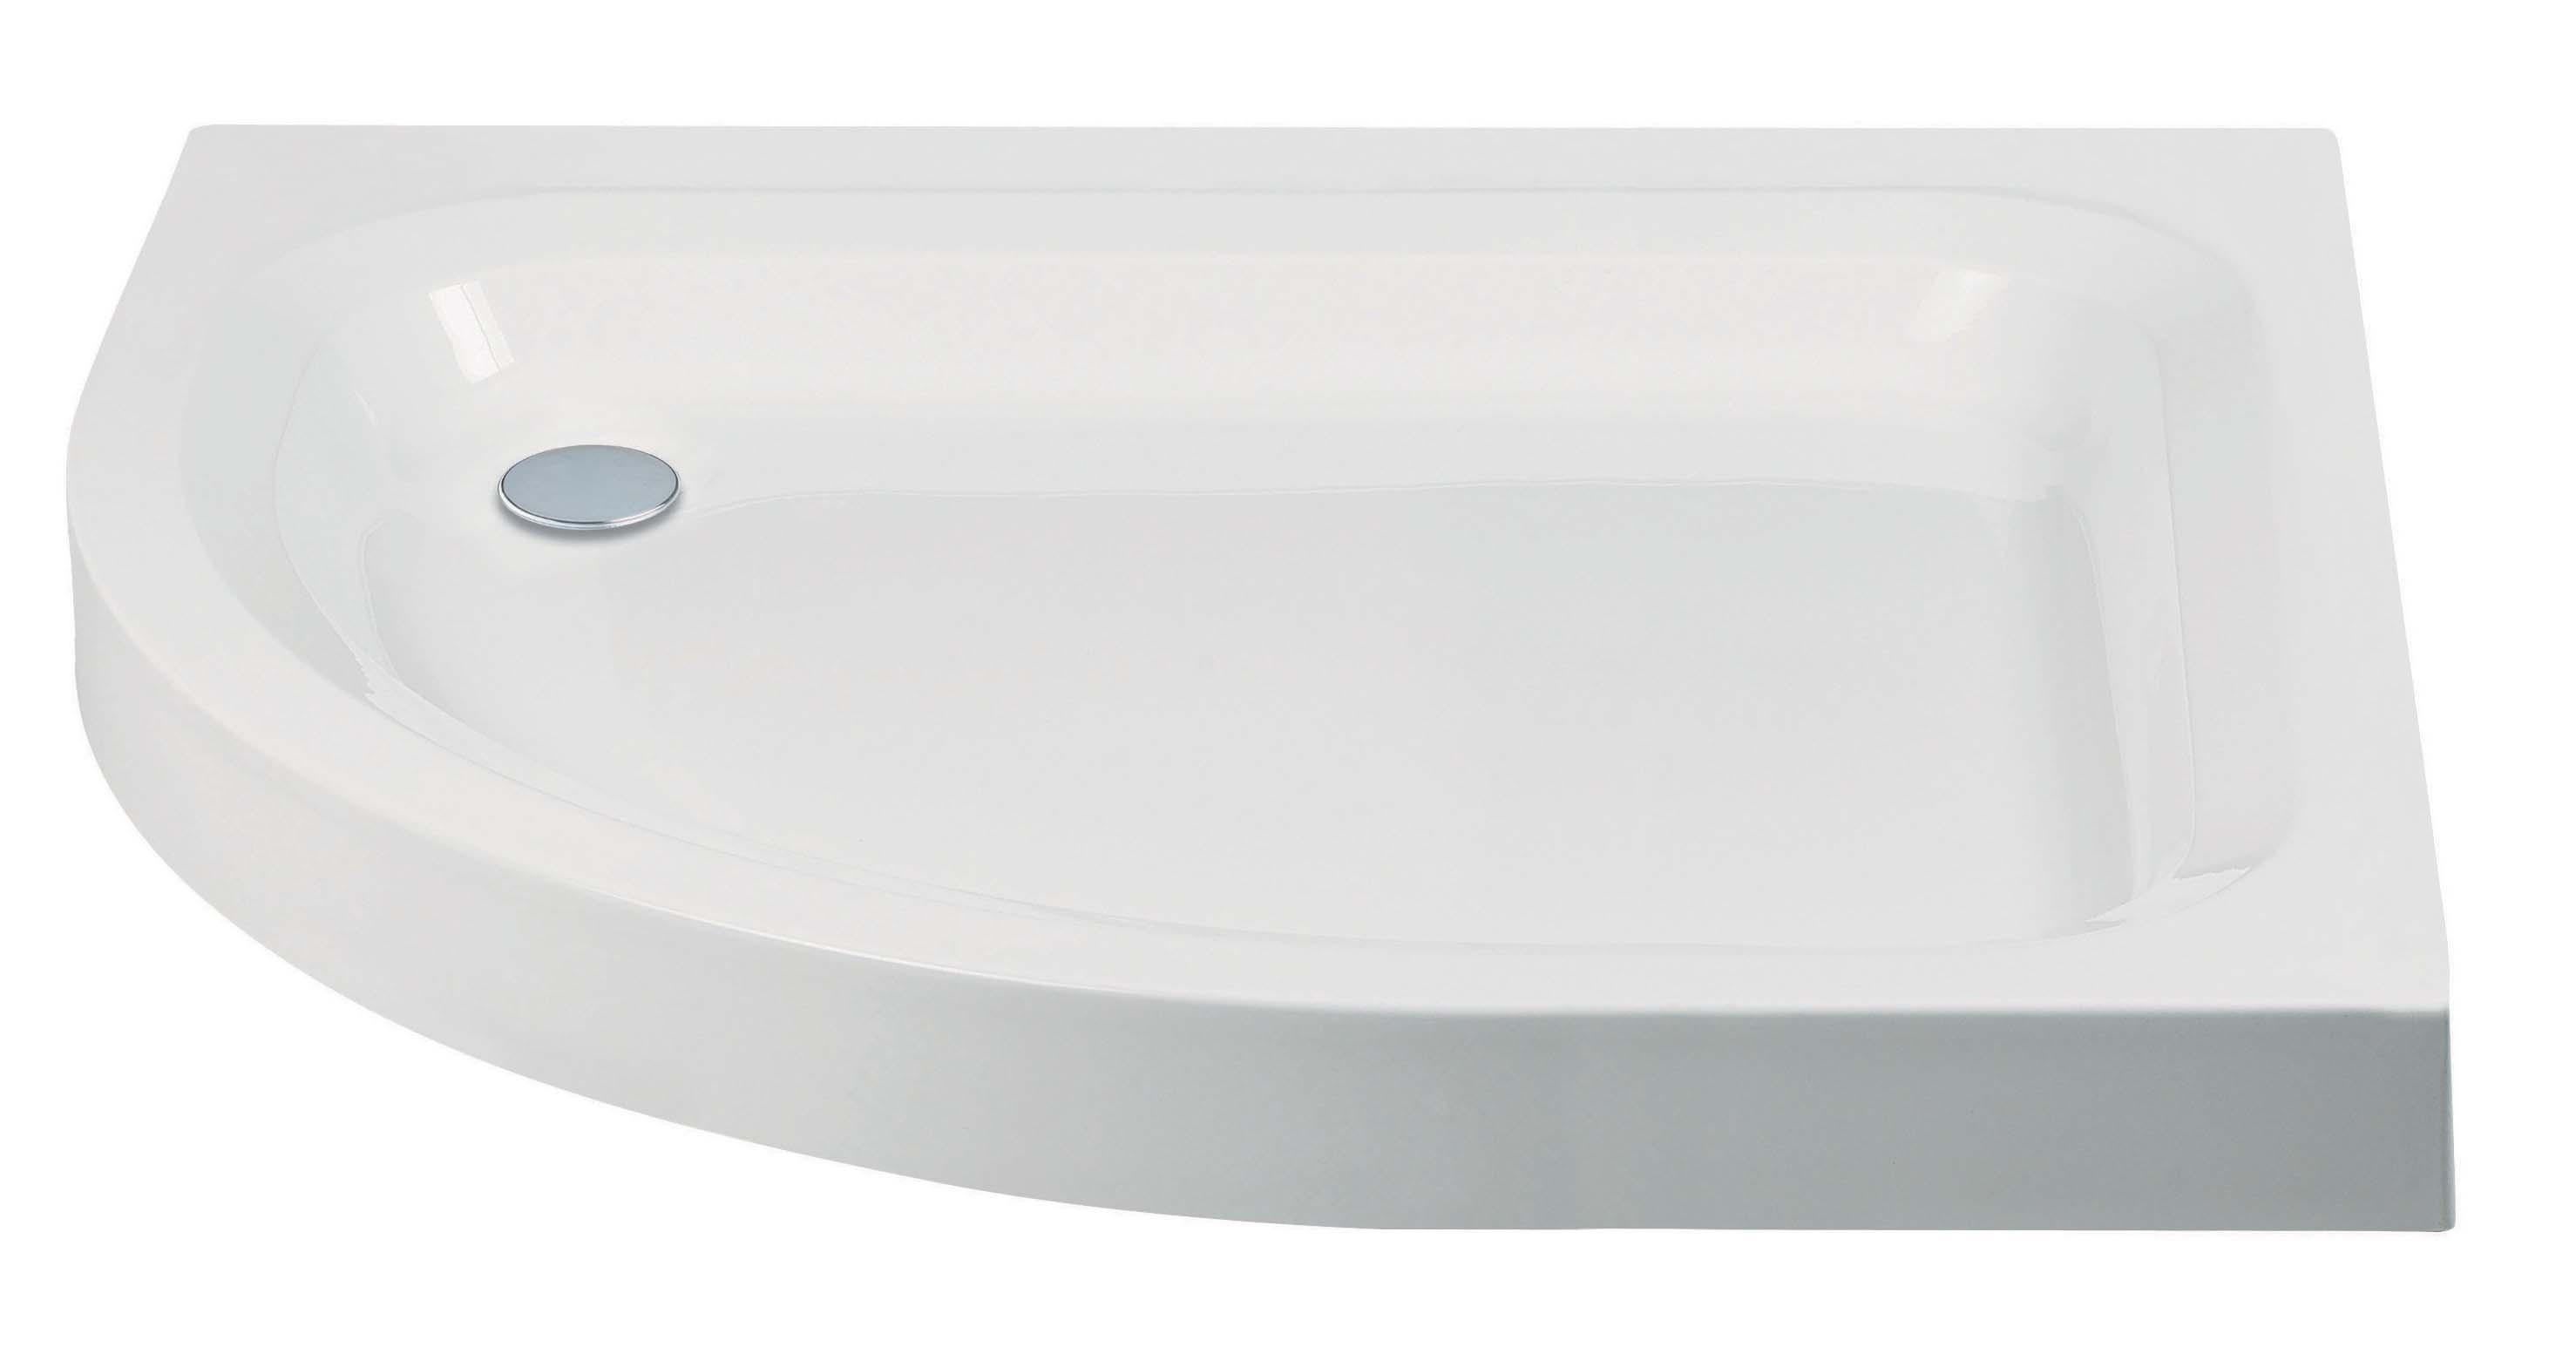 Standard Offset Quadrant Shower Tray with Anti-Slip Option